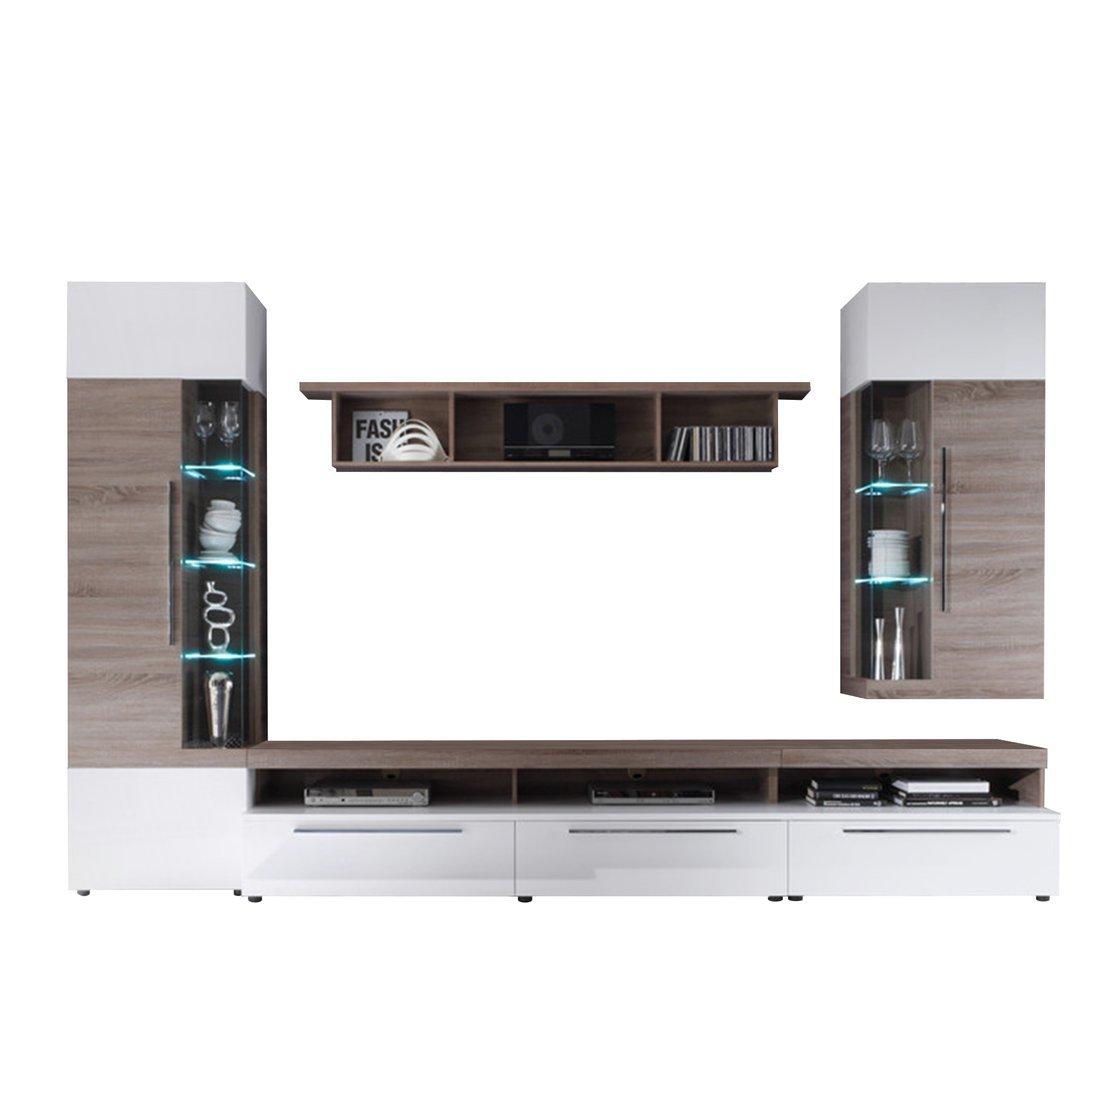 Firstloft A0200 501 0000 Wohnwand Cosmos, Sonoma Eiche Trüffel, Modernes  Design, 330 X 210 X 52 Cm, Weiß Hochglanz Günstig